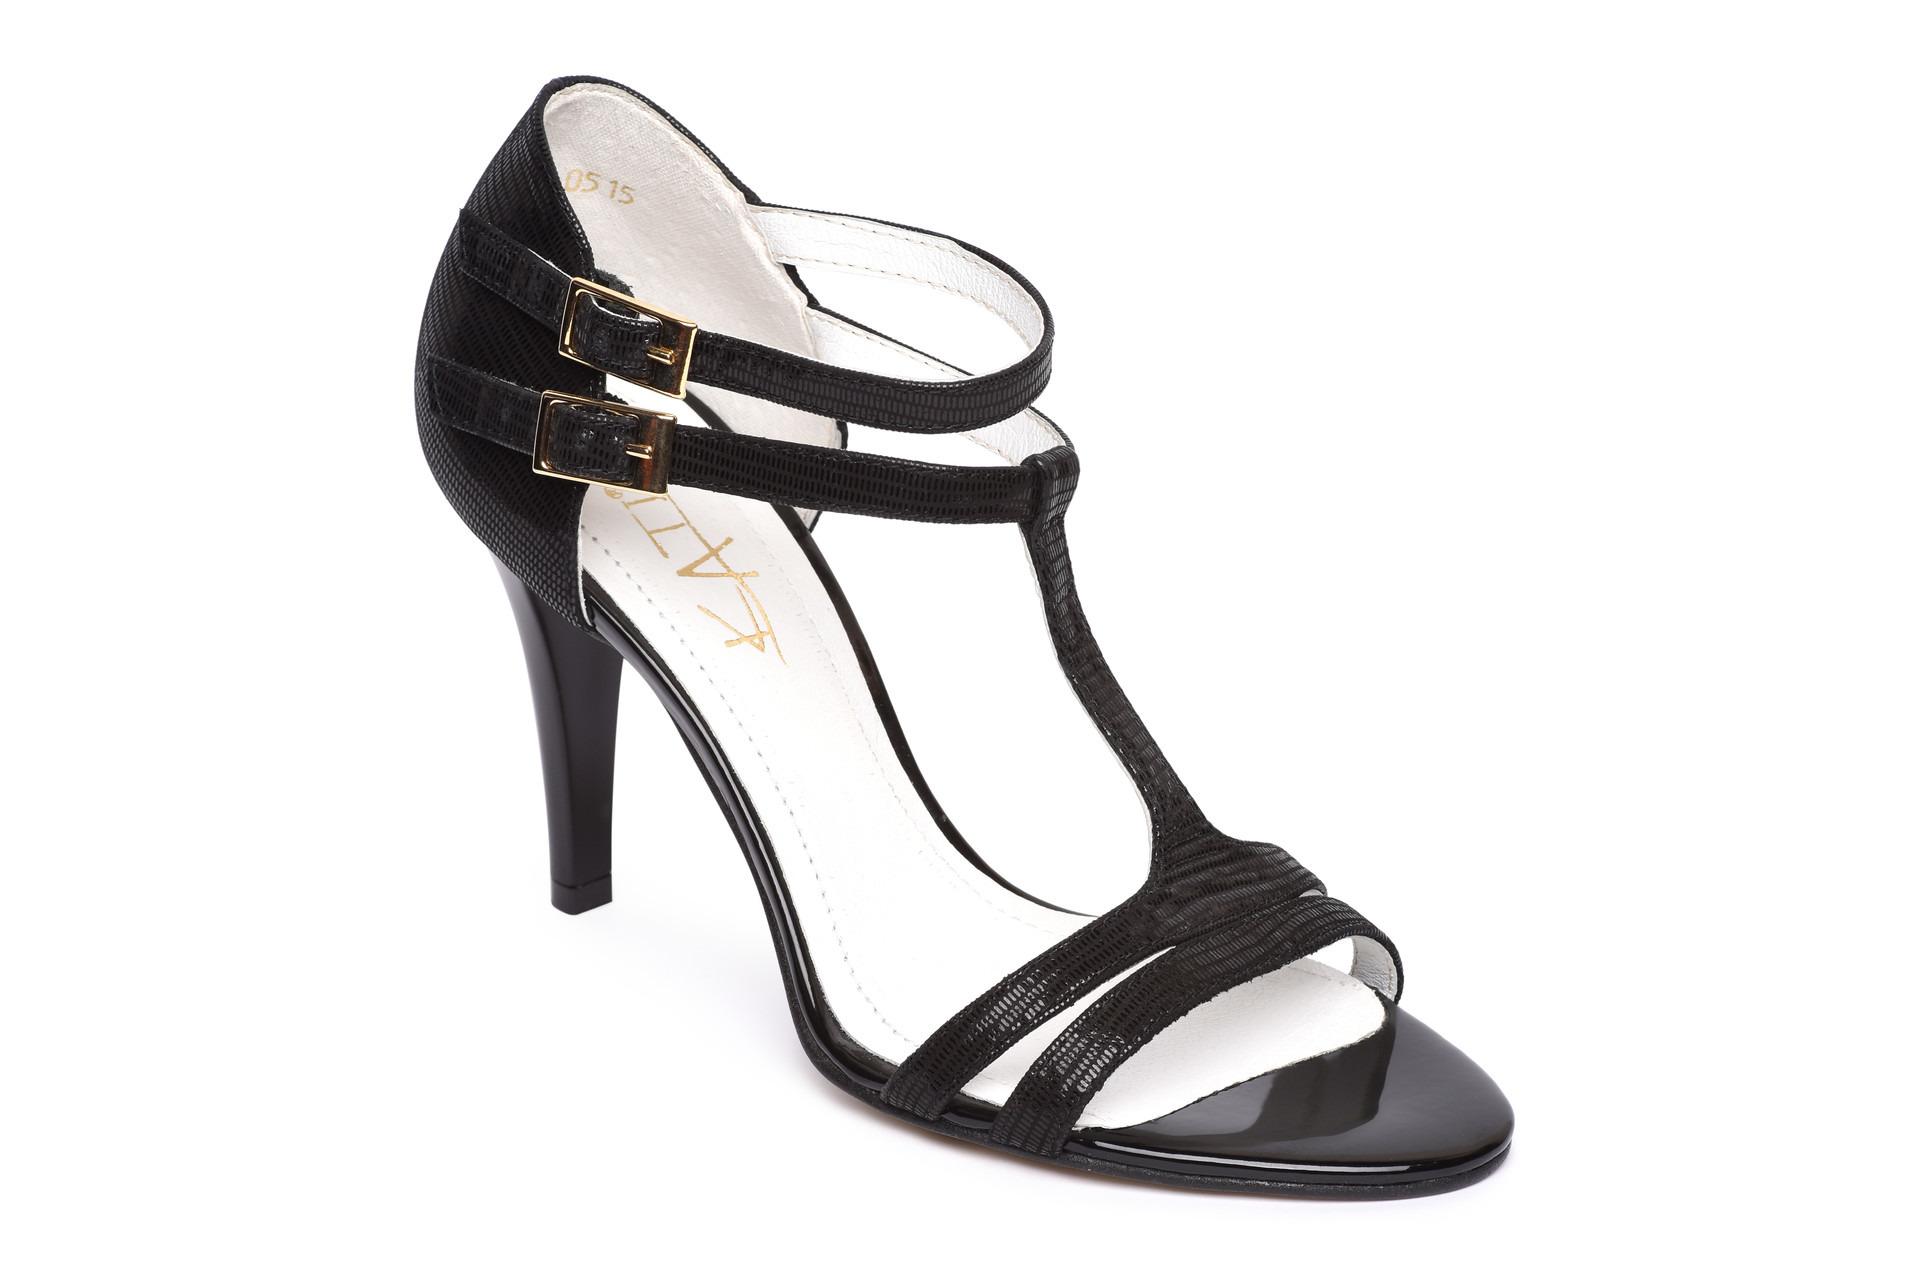 12ccb0d5b69f GALLERY SHOES - Sandále - Sandále čierne spoločenské s pevnou pätou KATI